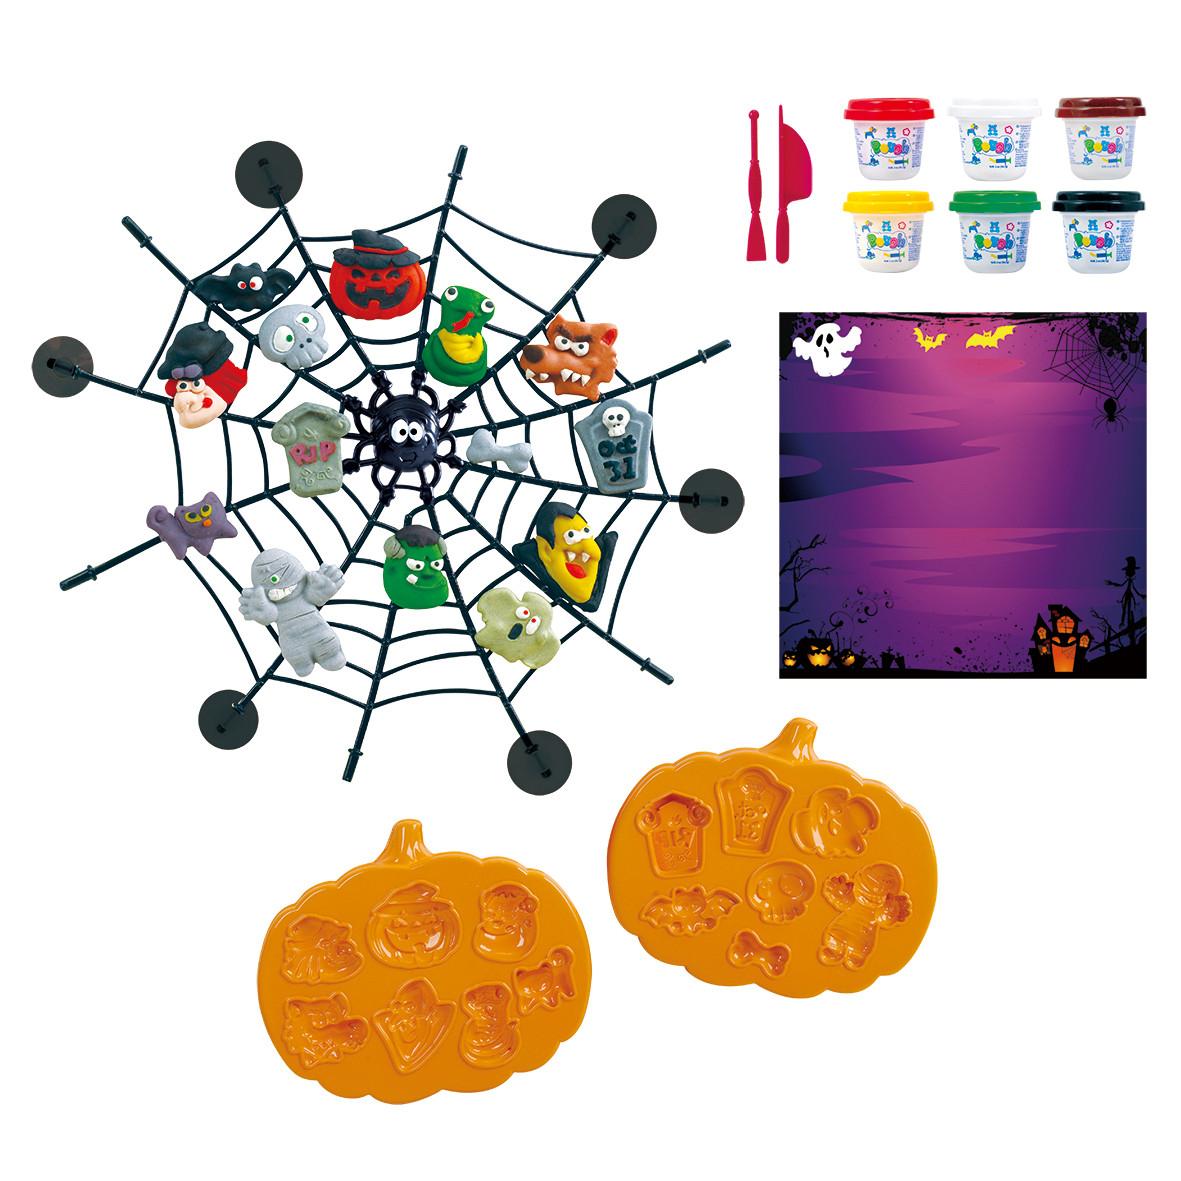 Творчество и рукоделие «Playgo Toys Enterprises Limited» (8540) набор для лепки Паутина